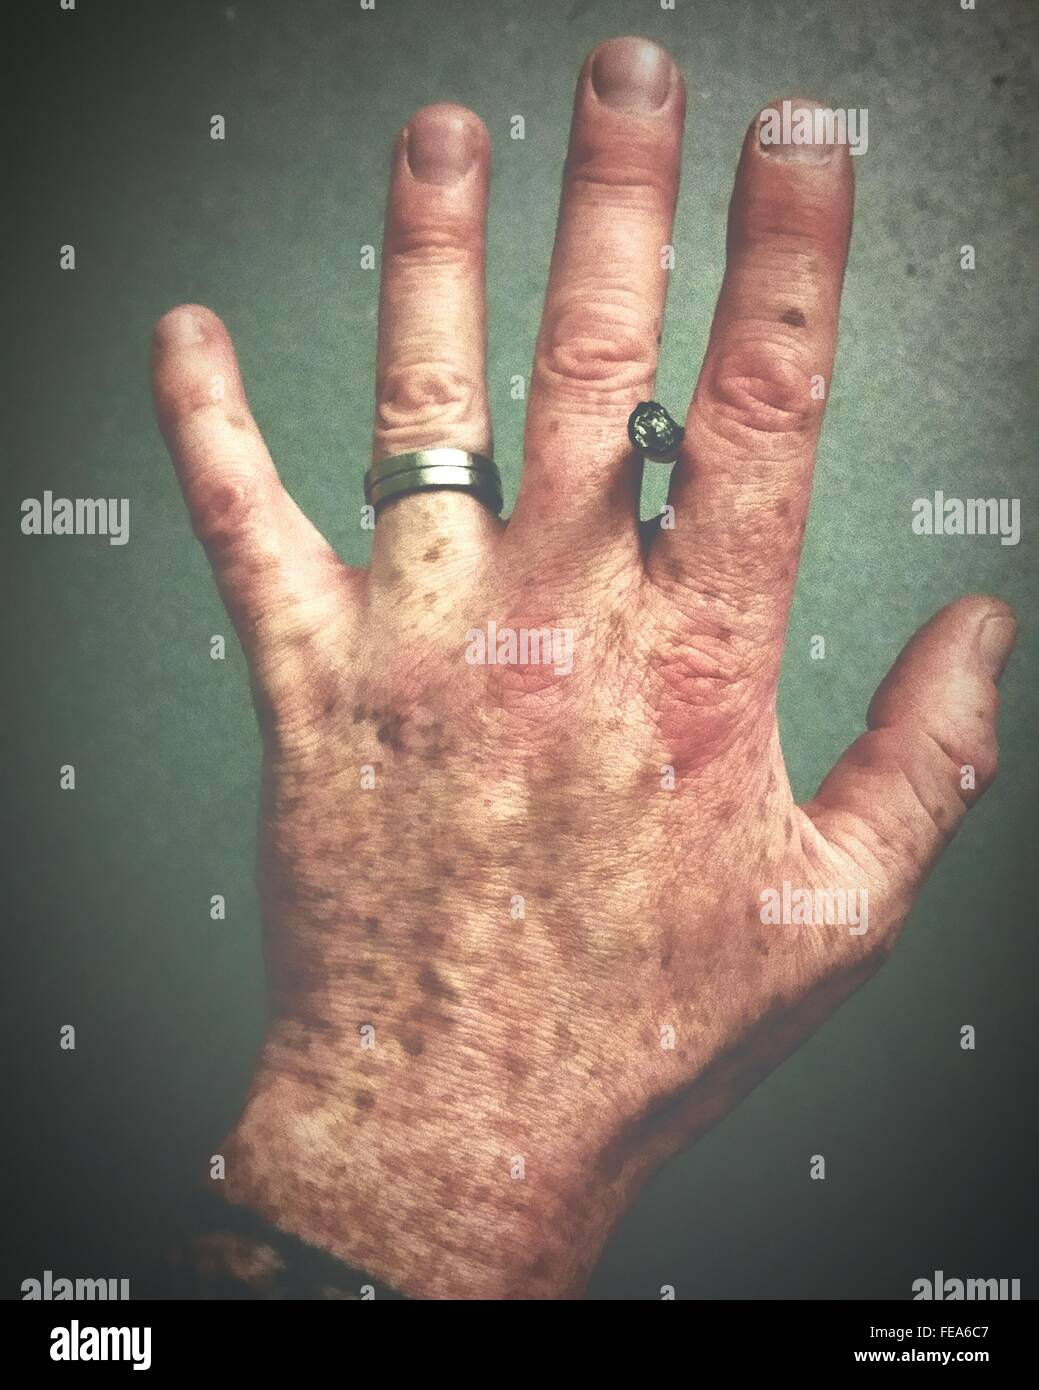 Close-Up Human Hand - Stock Image